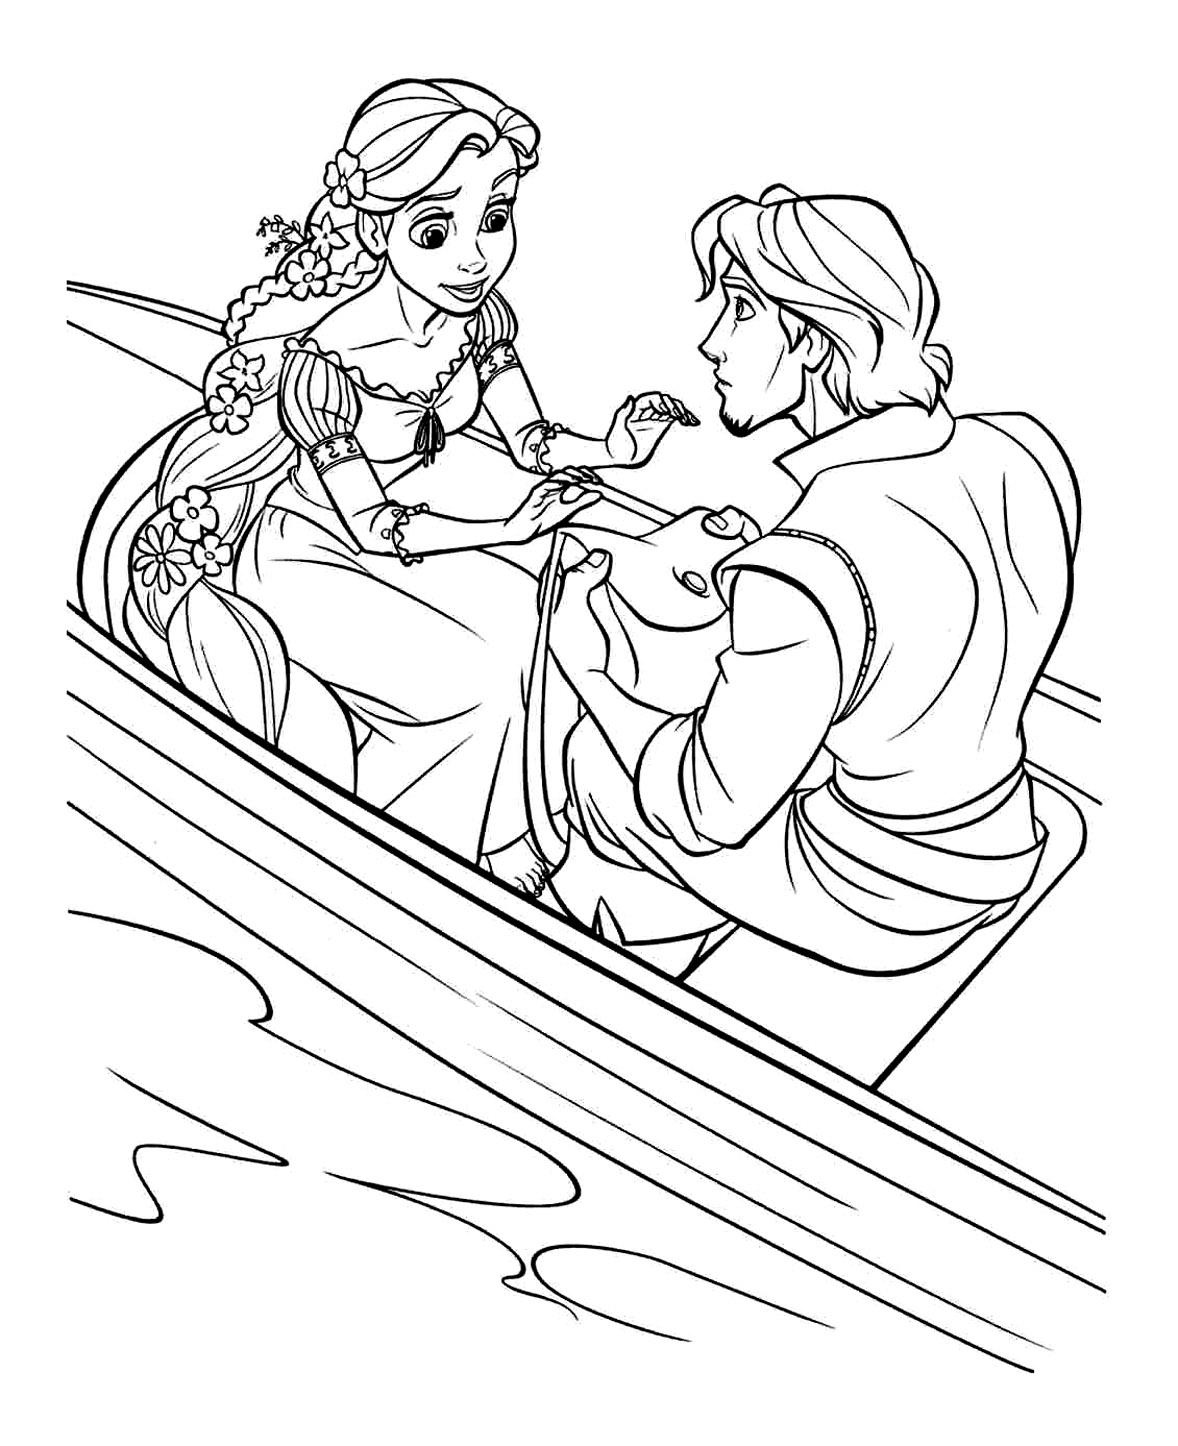 Raiponce flynn bateau coloriage raiponce coloriages - Dessin a imprimer raiponce ...